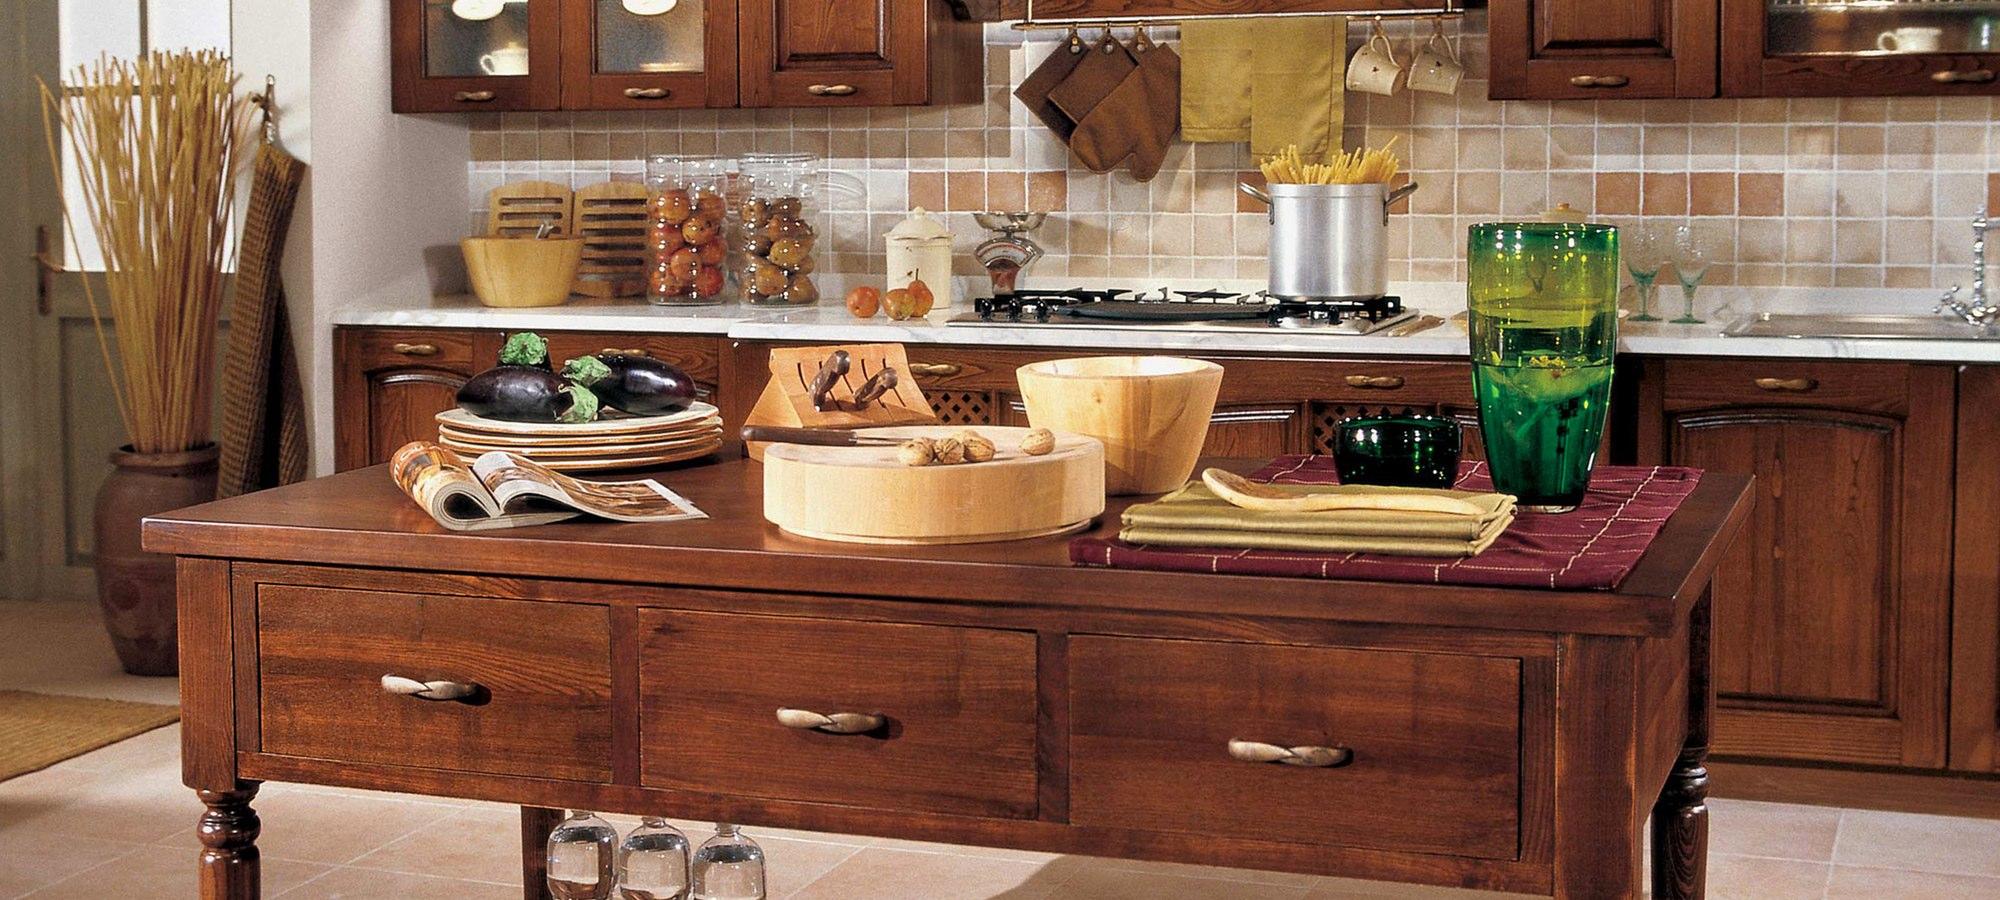 Cucine Classiche – Pagina 3 – Brennero Case Stili di Maistri ...